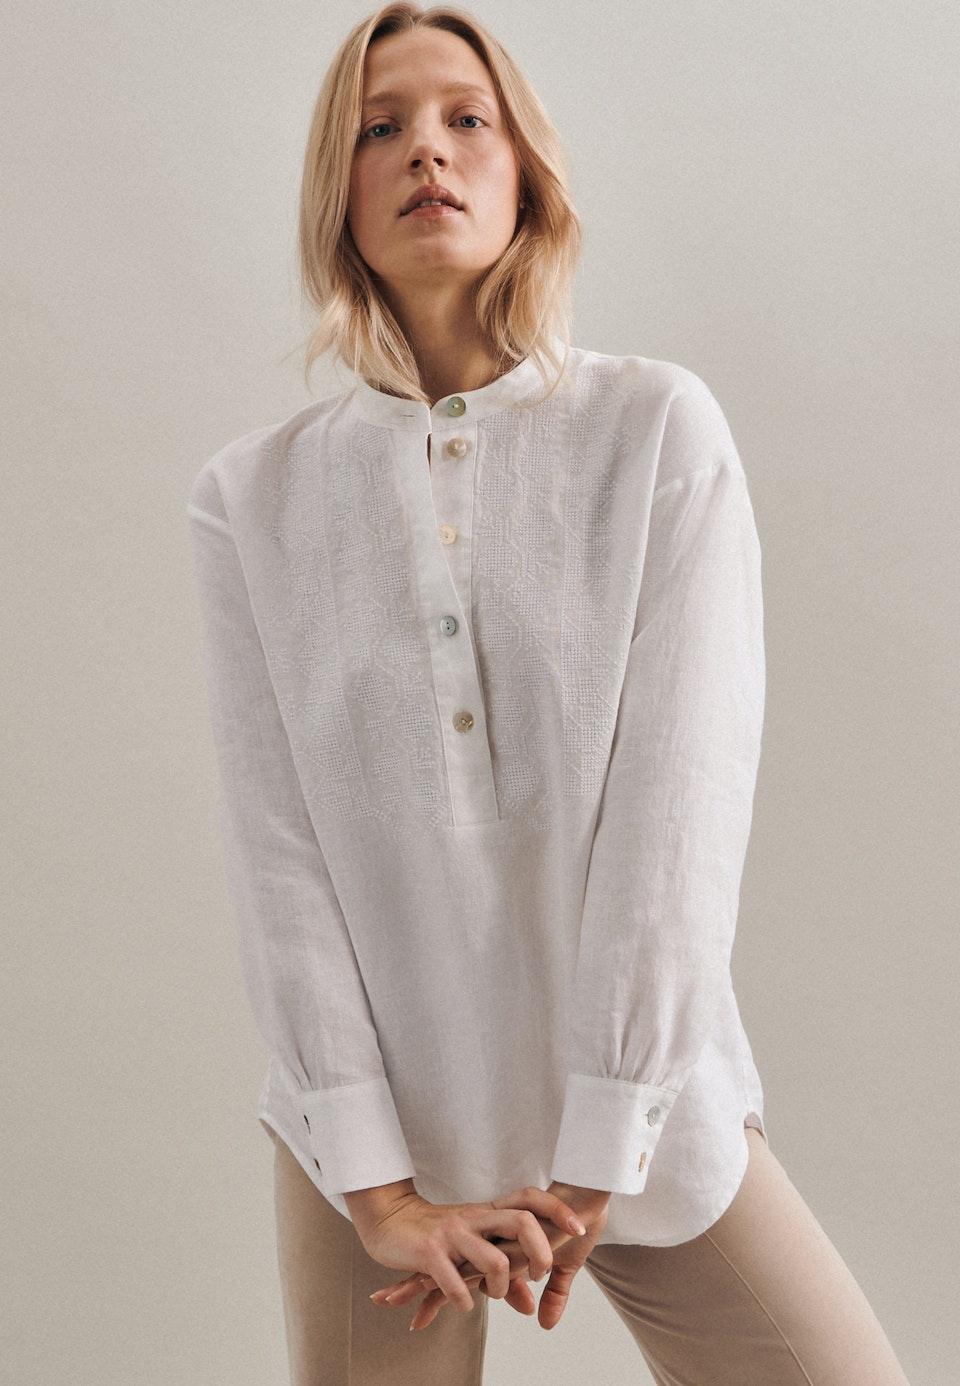 Leinen Stand-Up Blouse made of 100% Linen in White |  Seidensticker Onlineshop